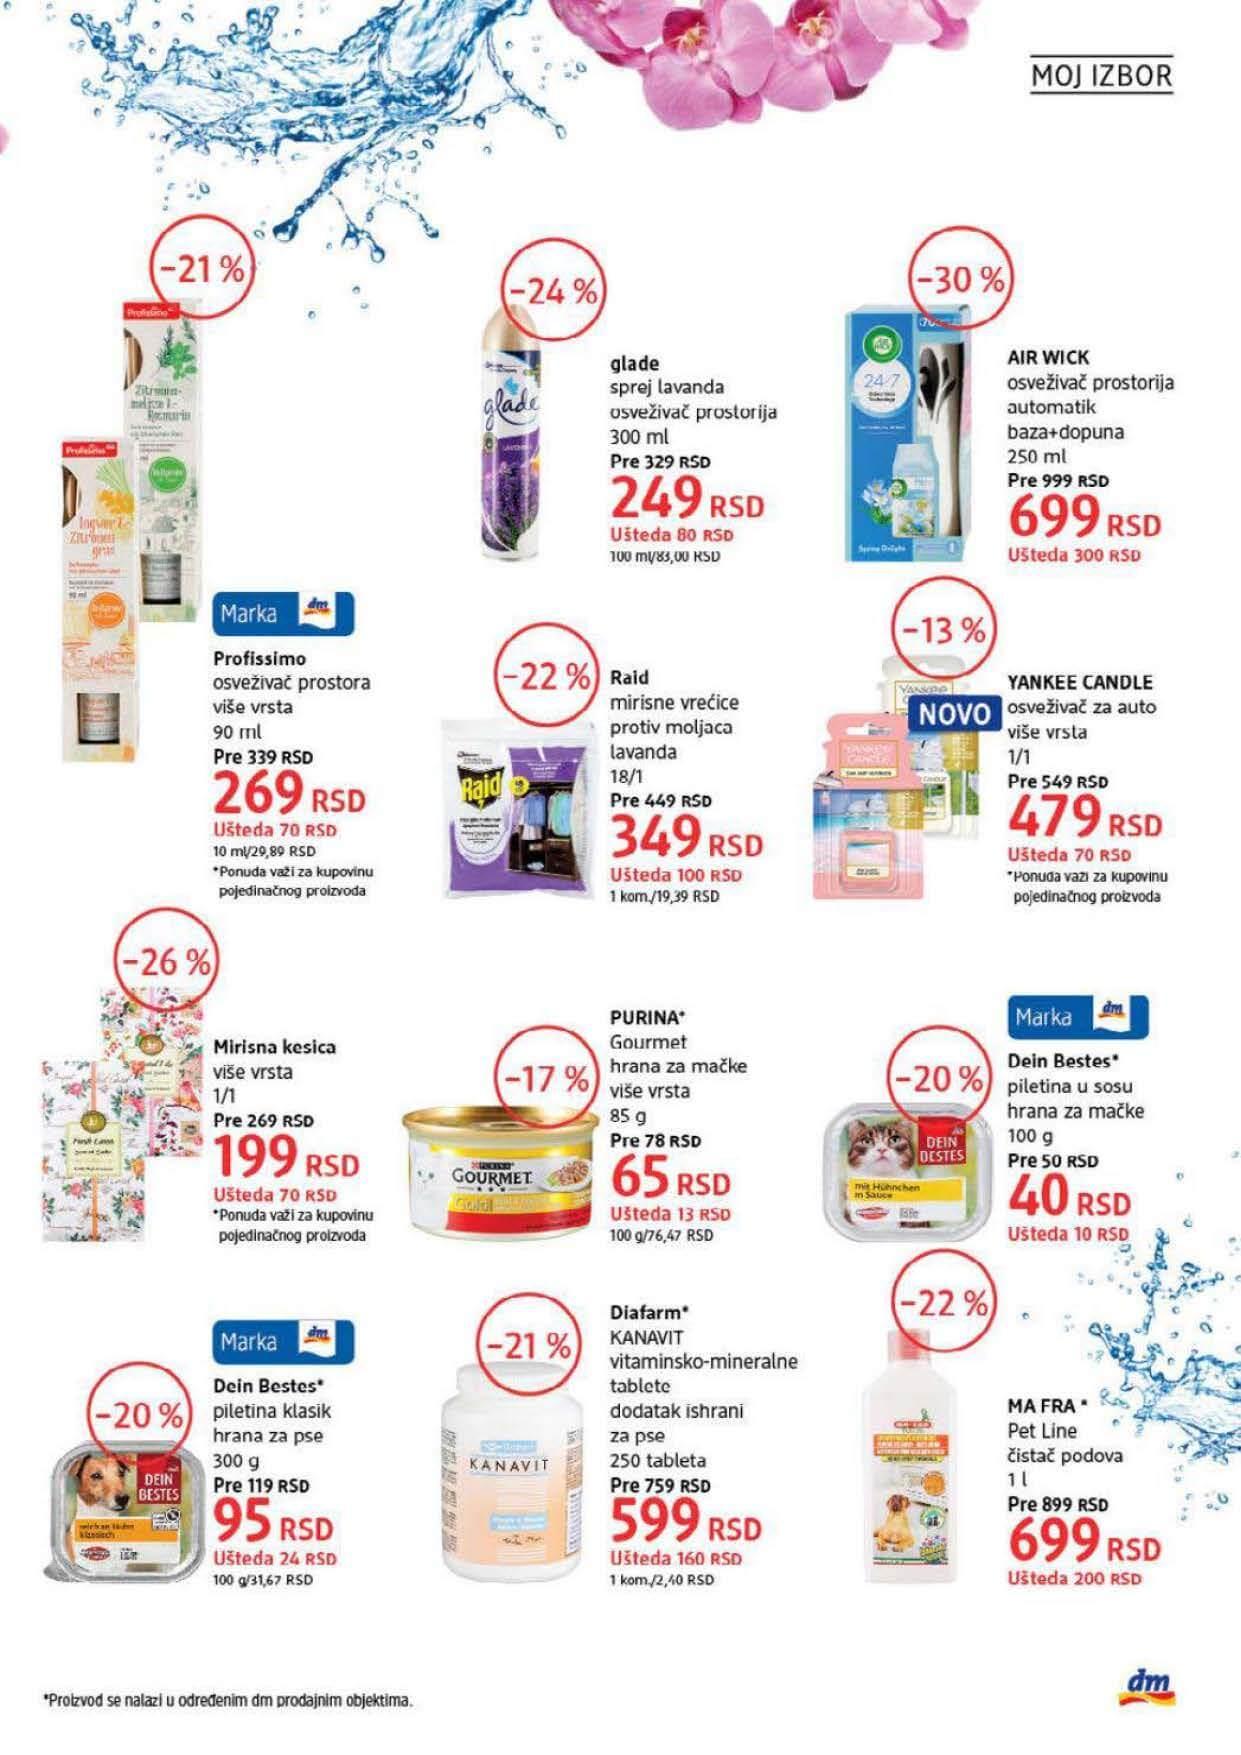 DM Katalog Srbija SEPTEMBAR 2021 1.9.2021. 30.9.2021. Page 39